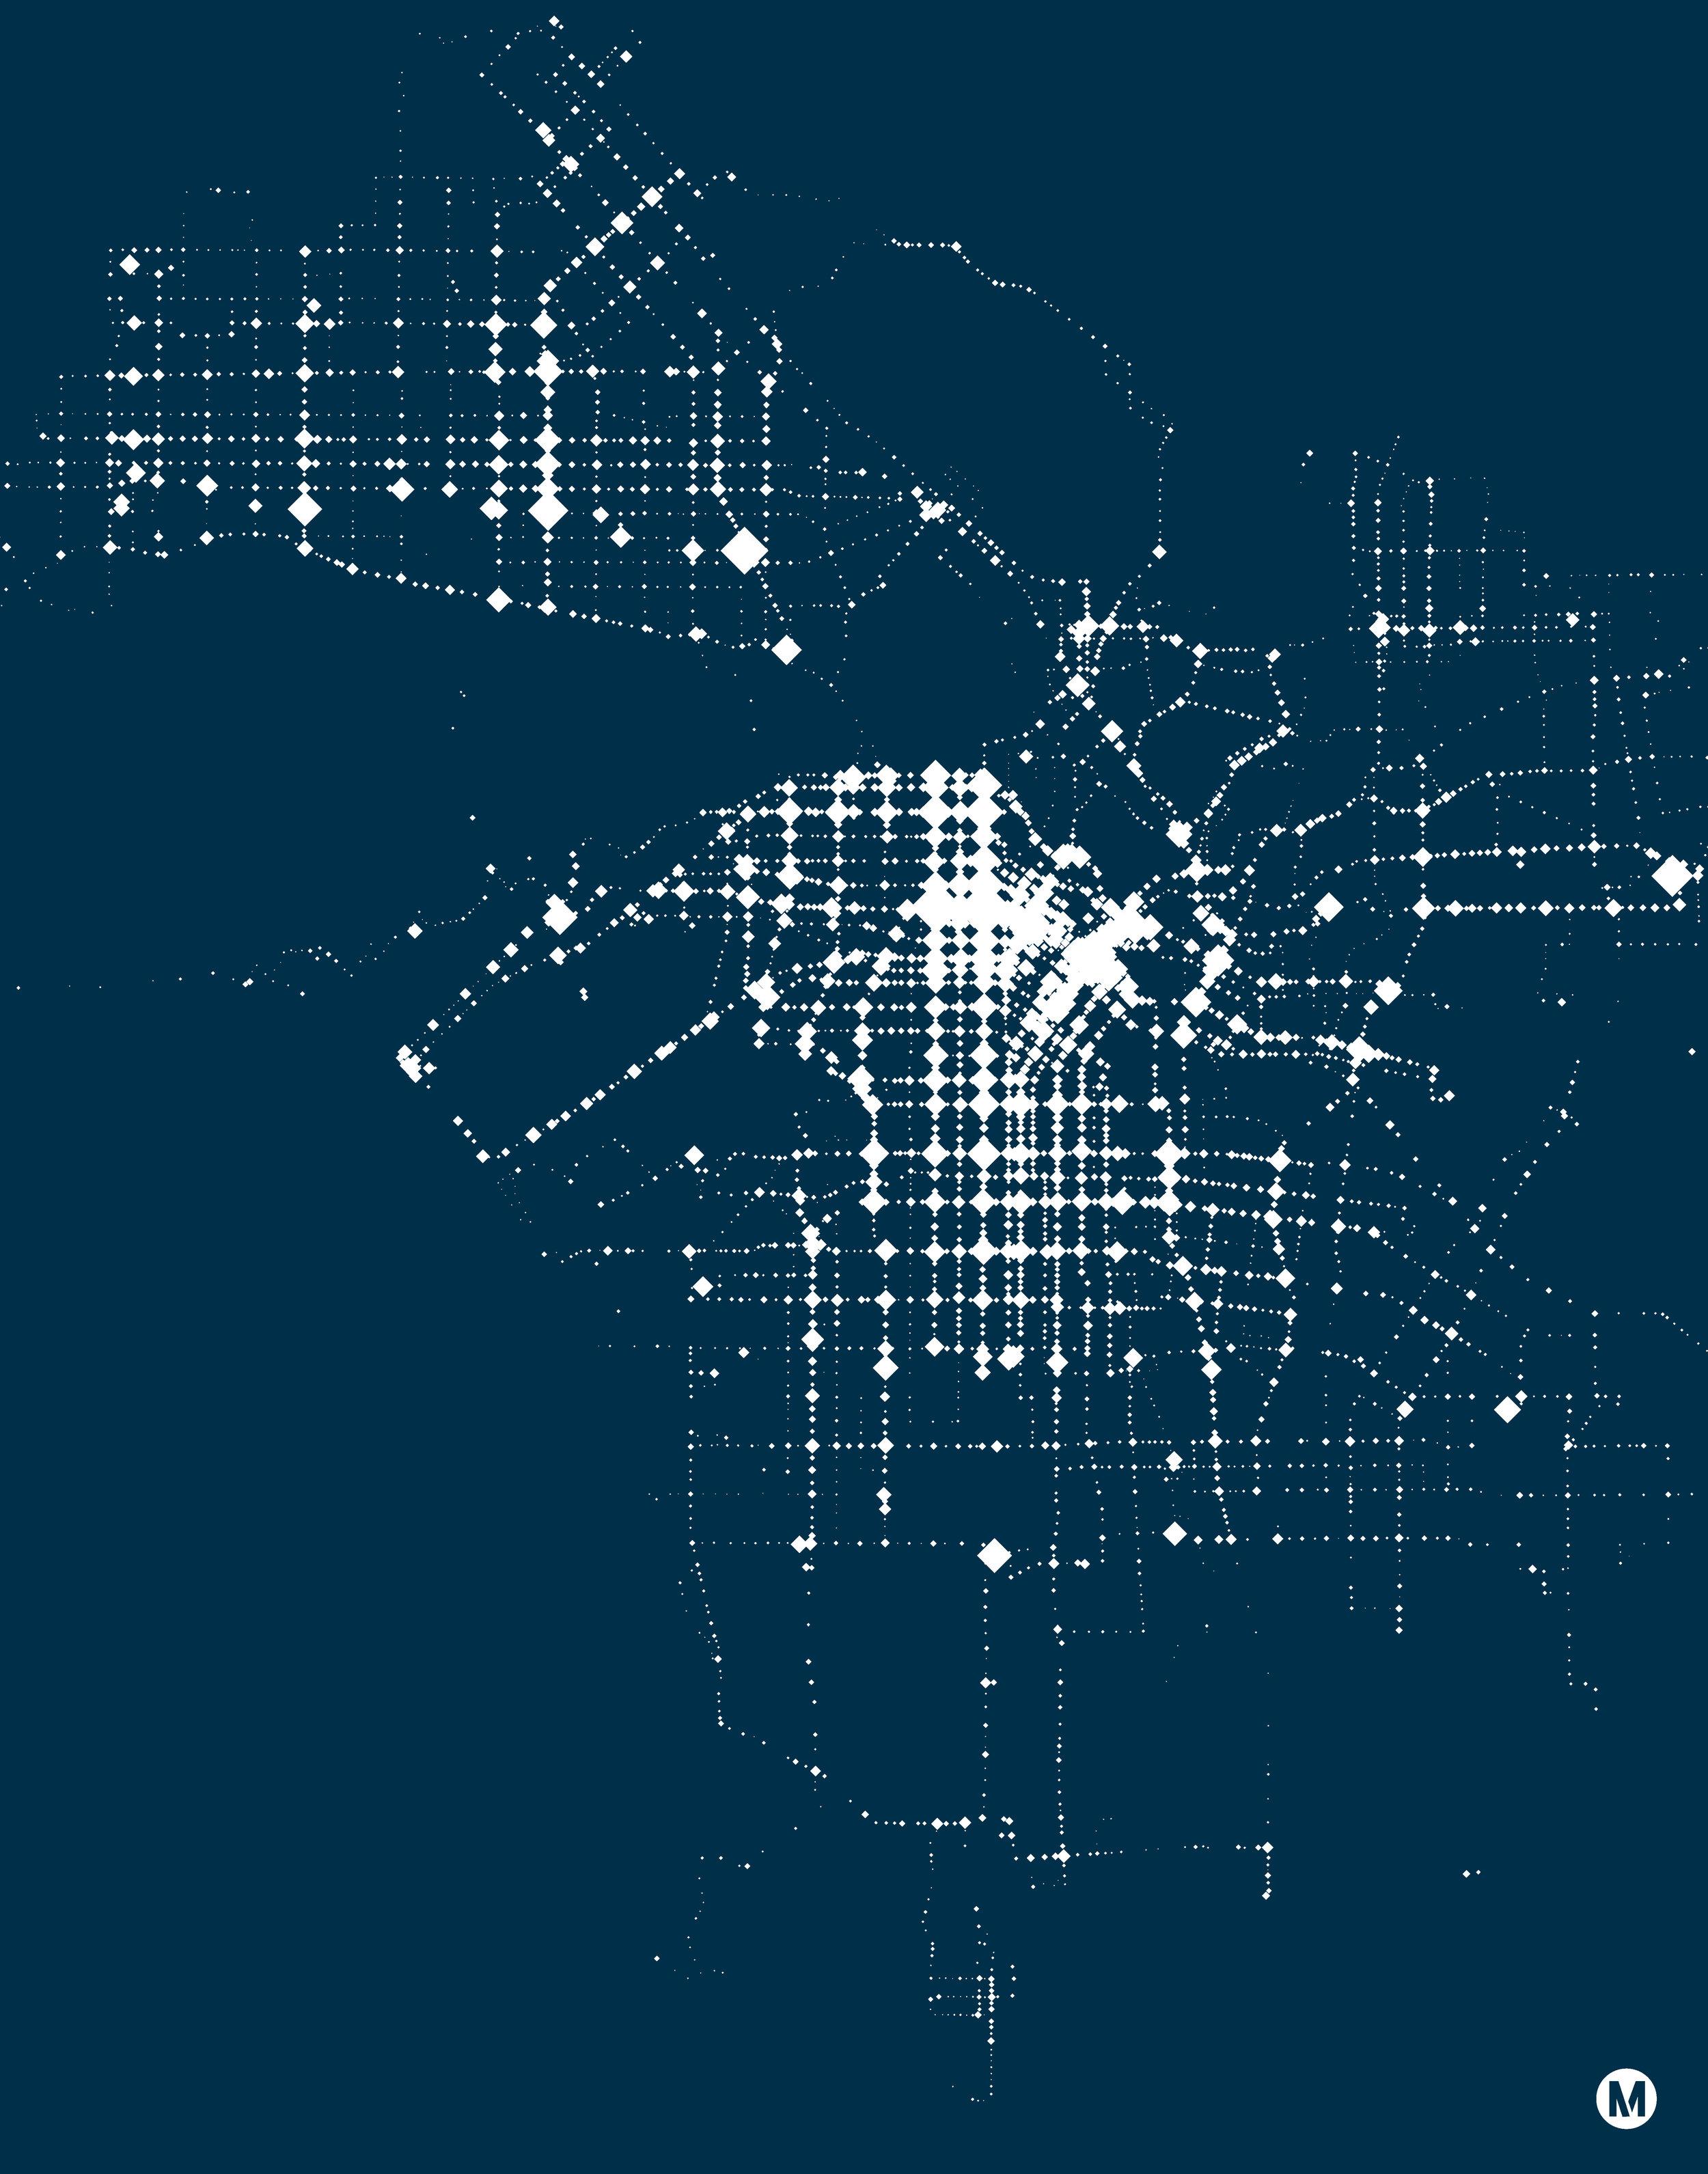 LA Metro Minimalist Map